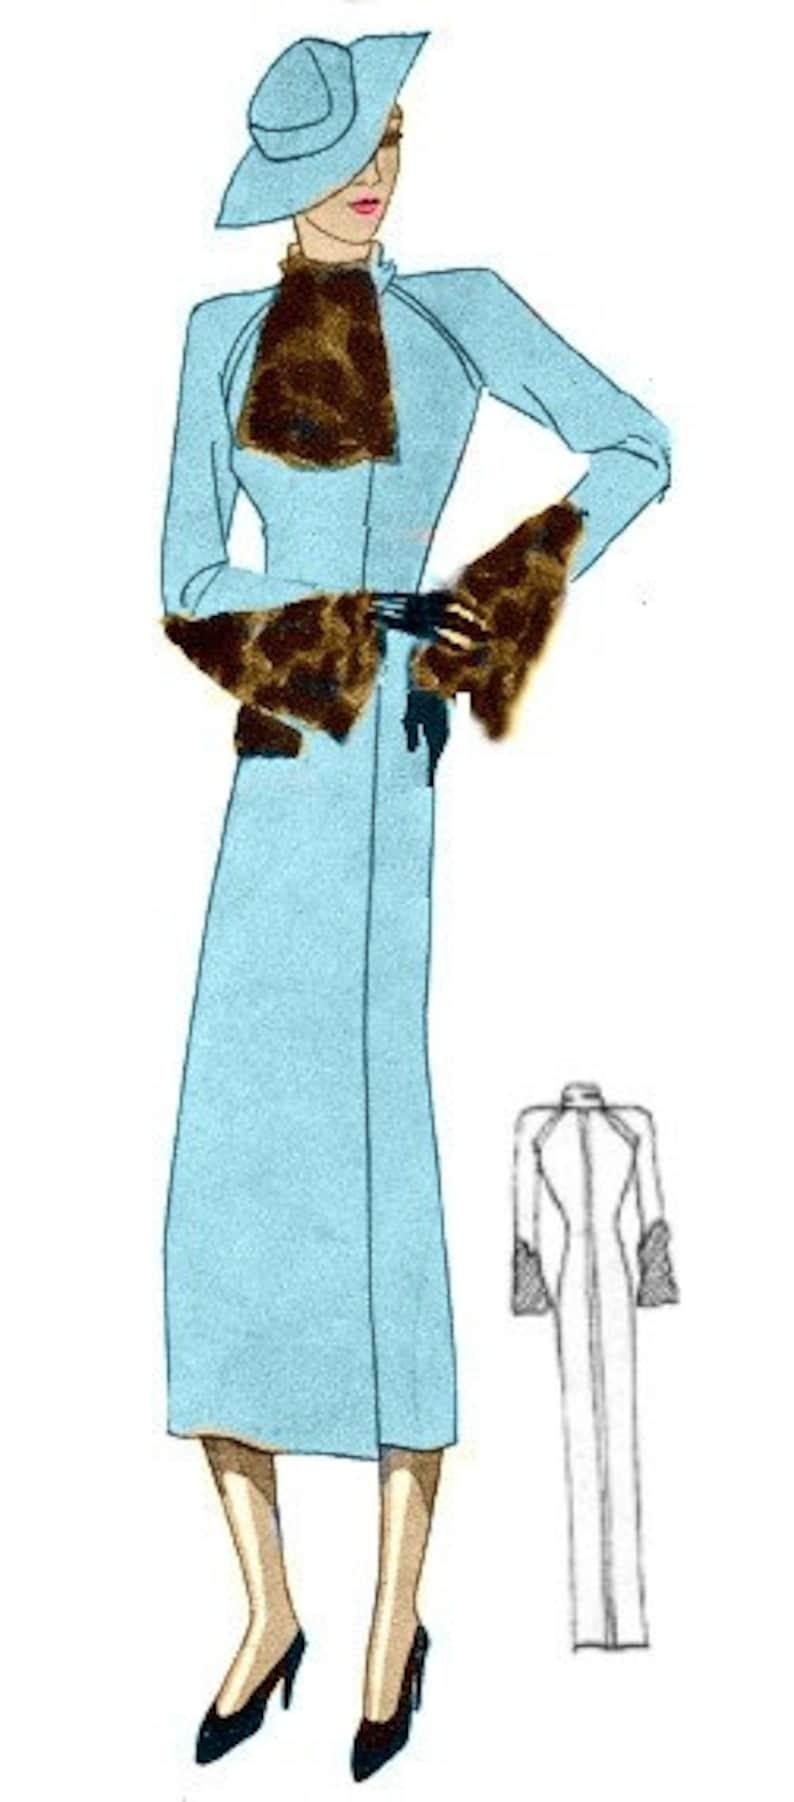 1930s Vintage Dresses, Clothing & Patterns Links Plus Size (or any size) Vintage 1934 Dress Sewing Pattern - PDF - Pattern 1590 Marietta 1930s 30s Patterns Instant Download $8.35 AT vintagedancer.com